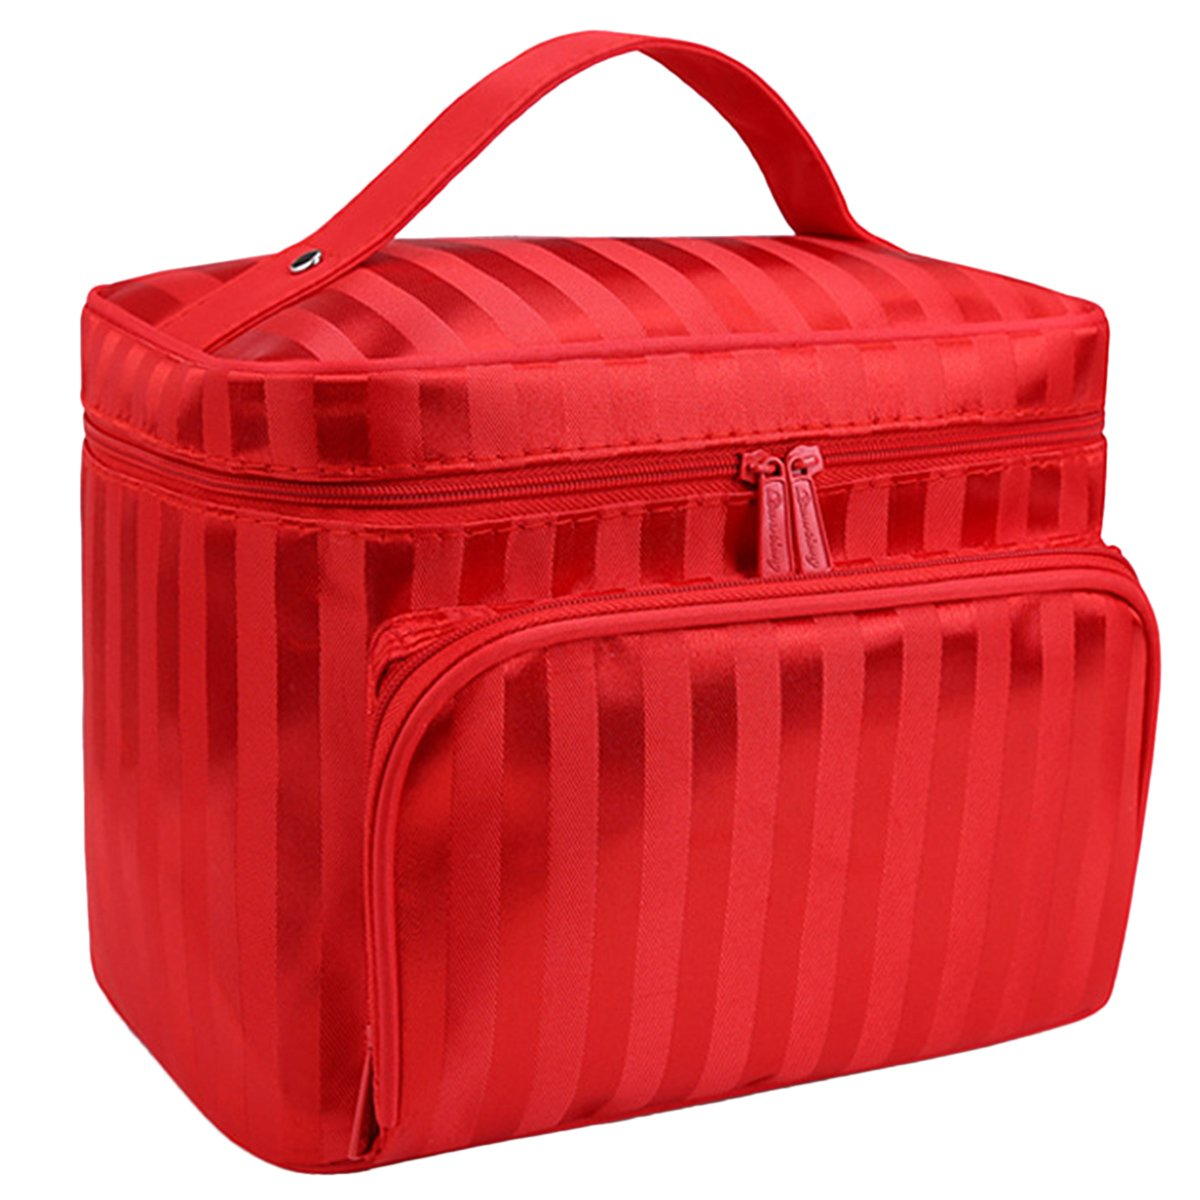 THEE Women Travel Toiletry Bag Cosmetic Makeup Kit Pouch Handbag Organizer